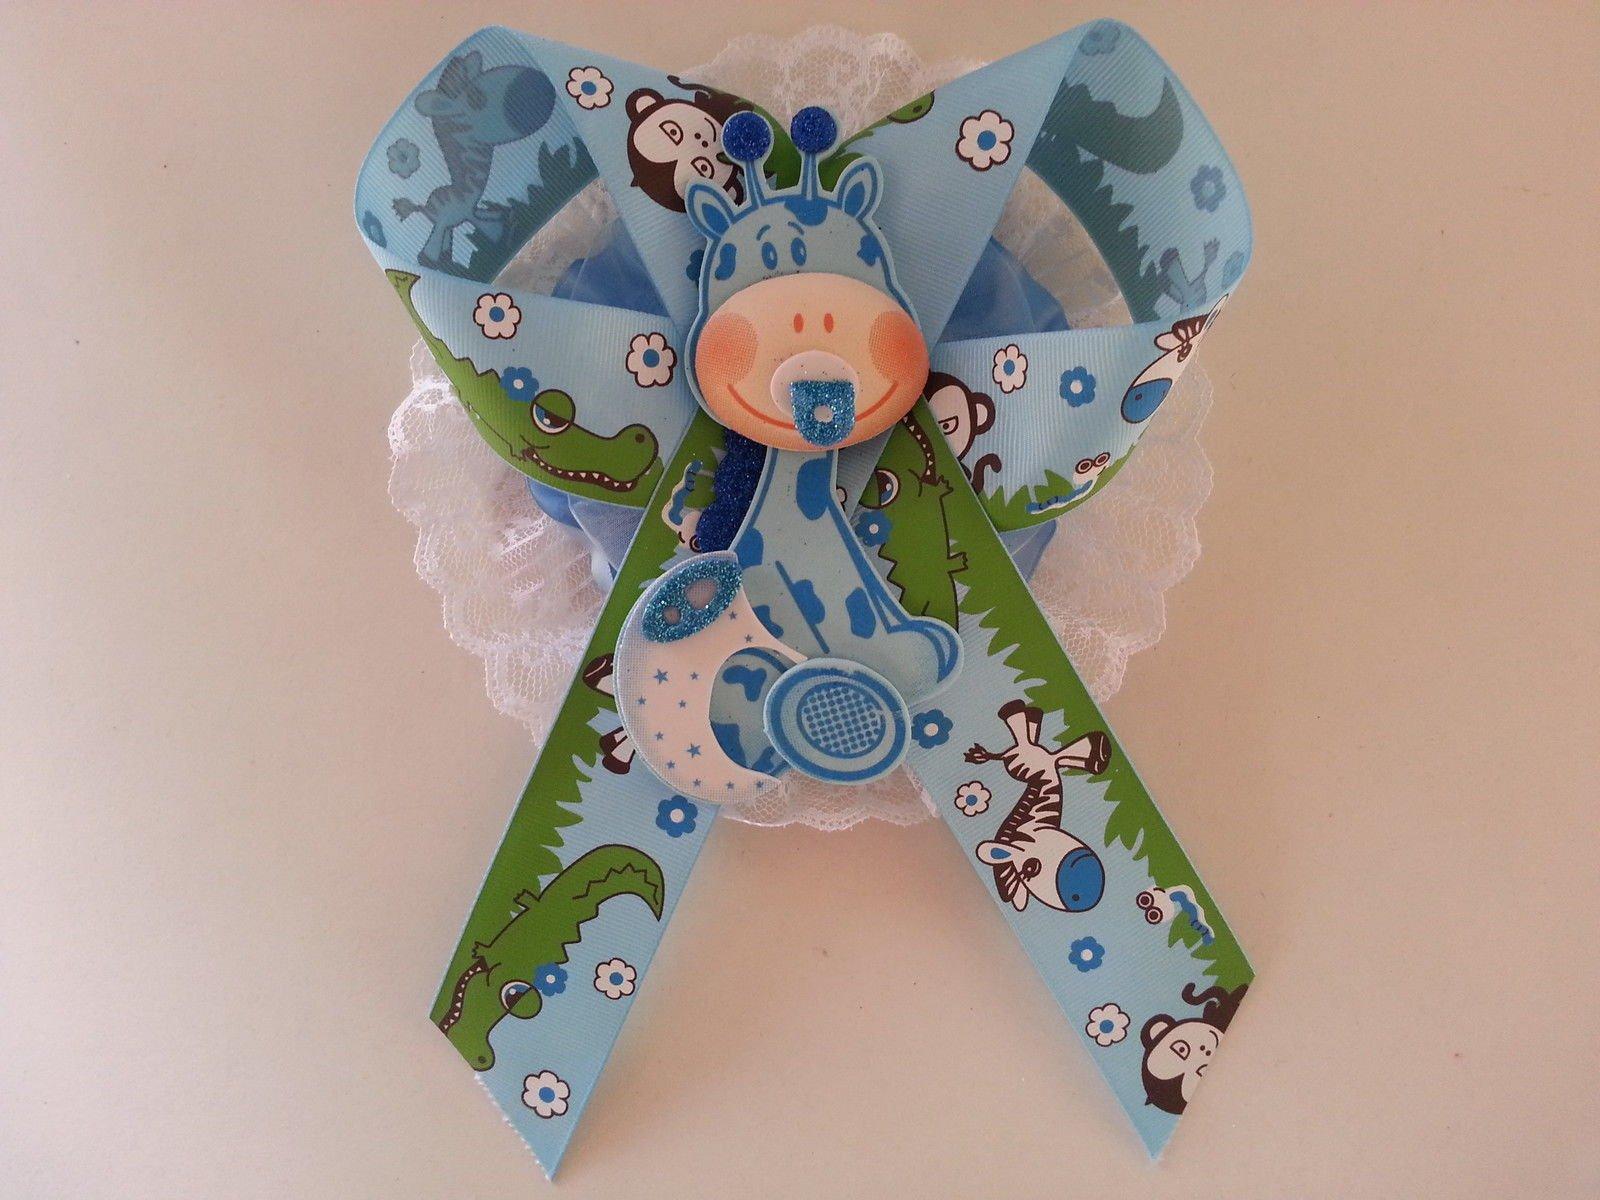 Baby Shower Mom To Be It's a Boy Sash Blue Giraffe Safari Ribbon Corsage Noah's by PRODUCT 789 (Image #4)